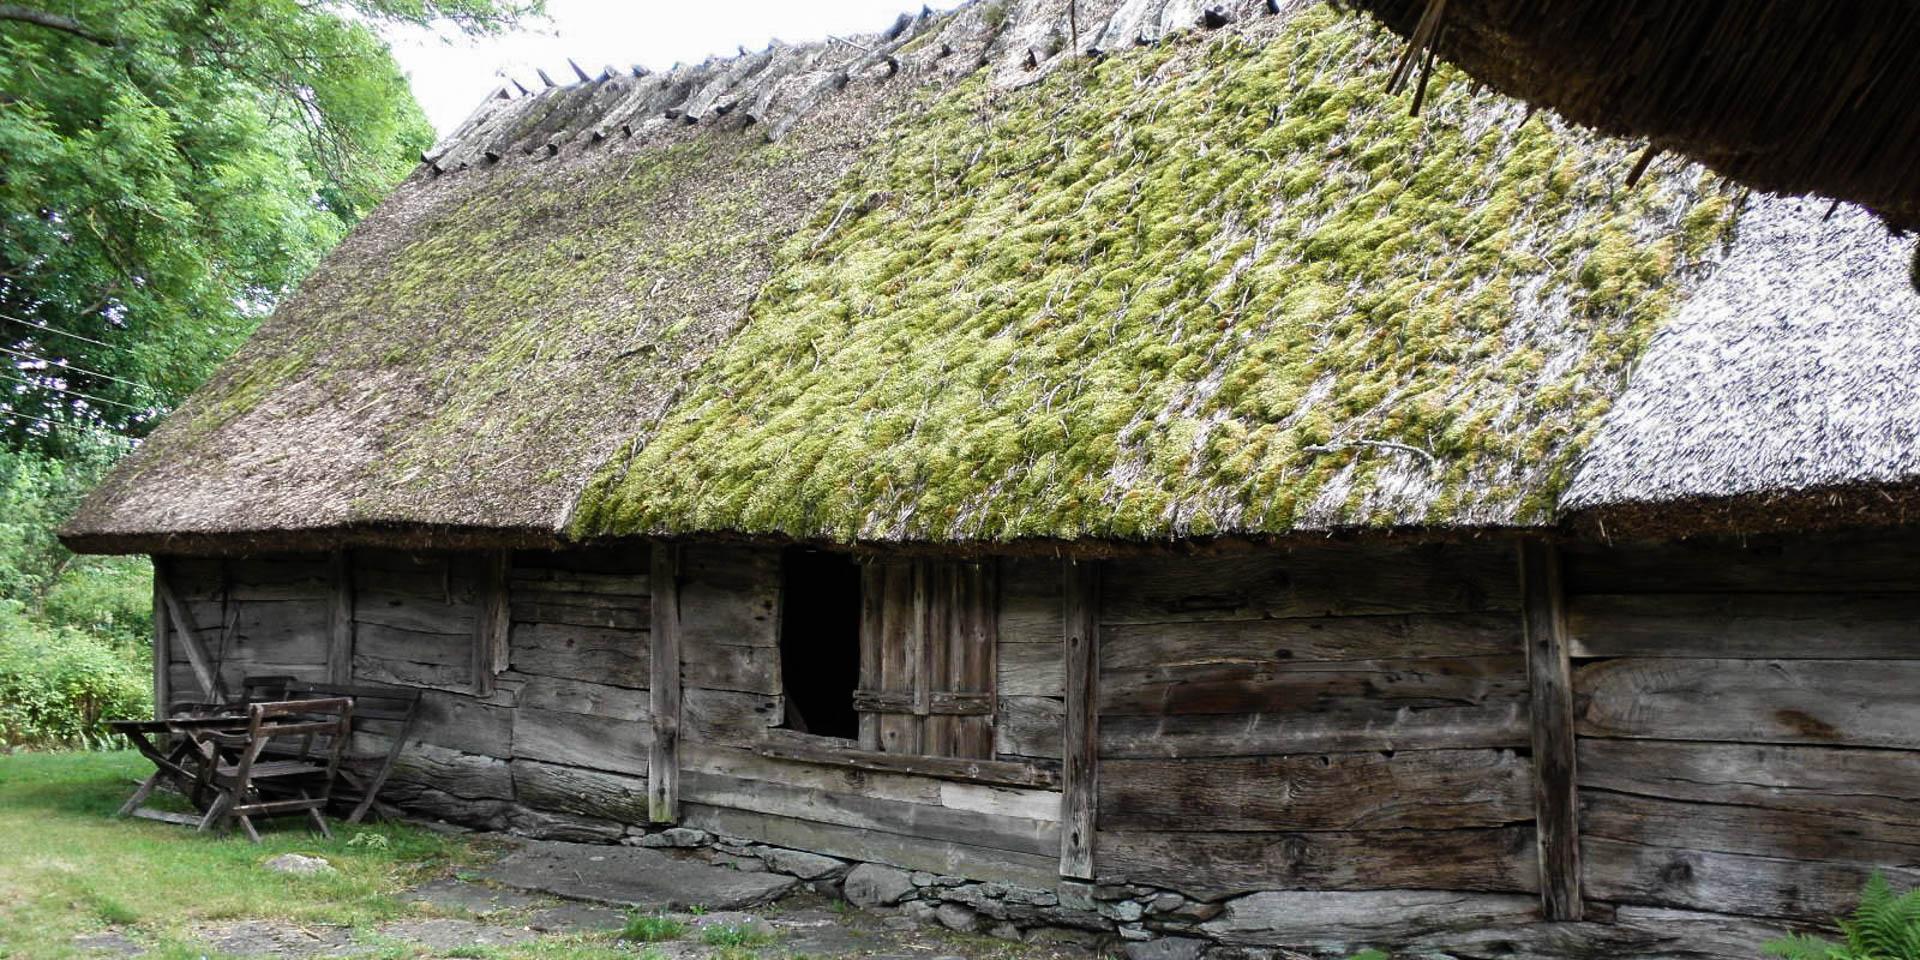 Åkrabergs Ladugård 2011